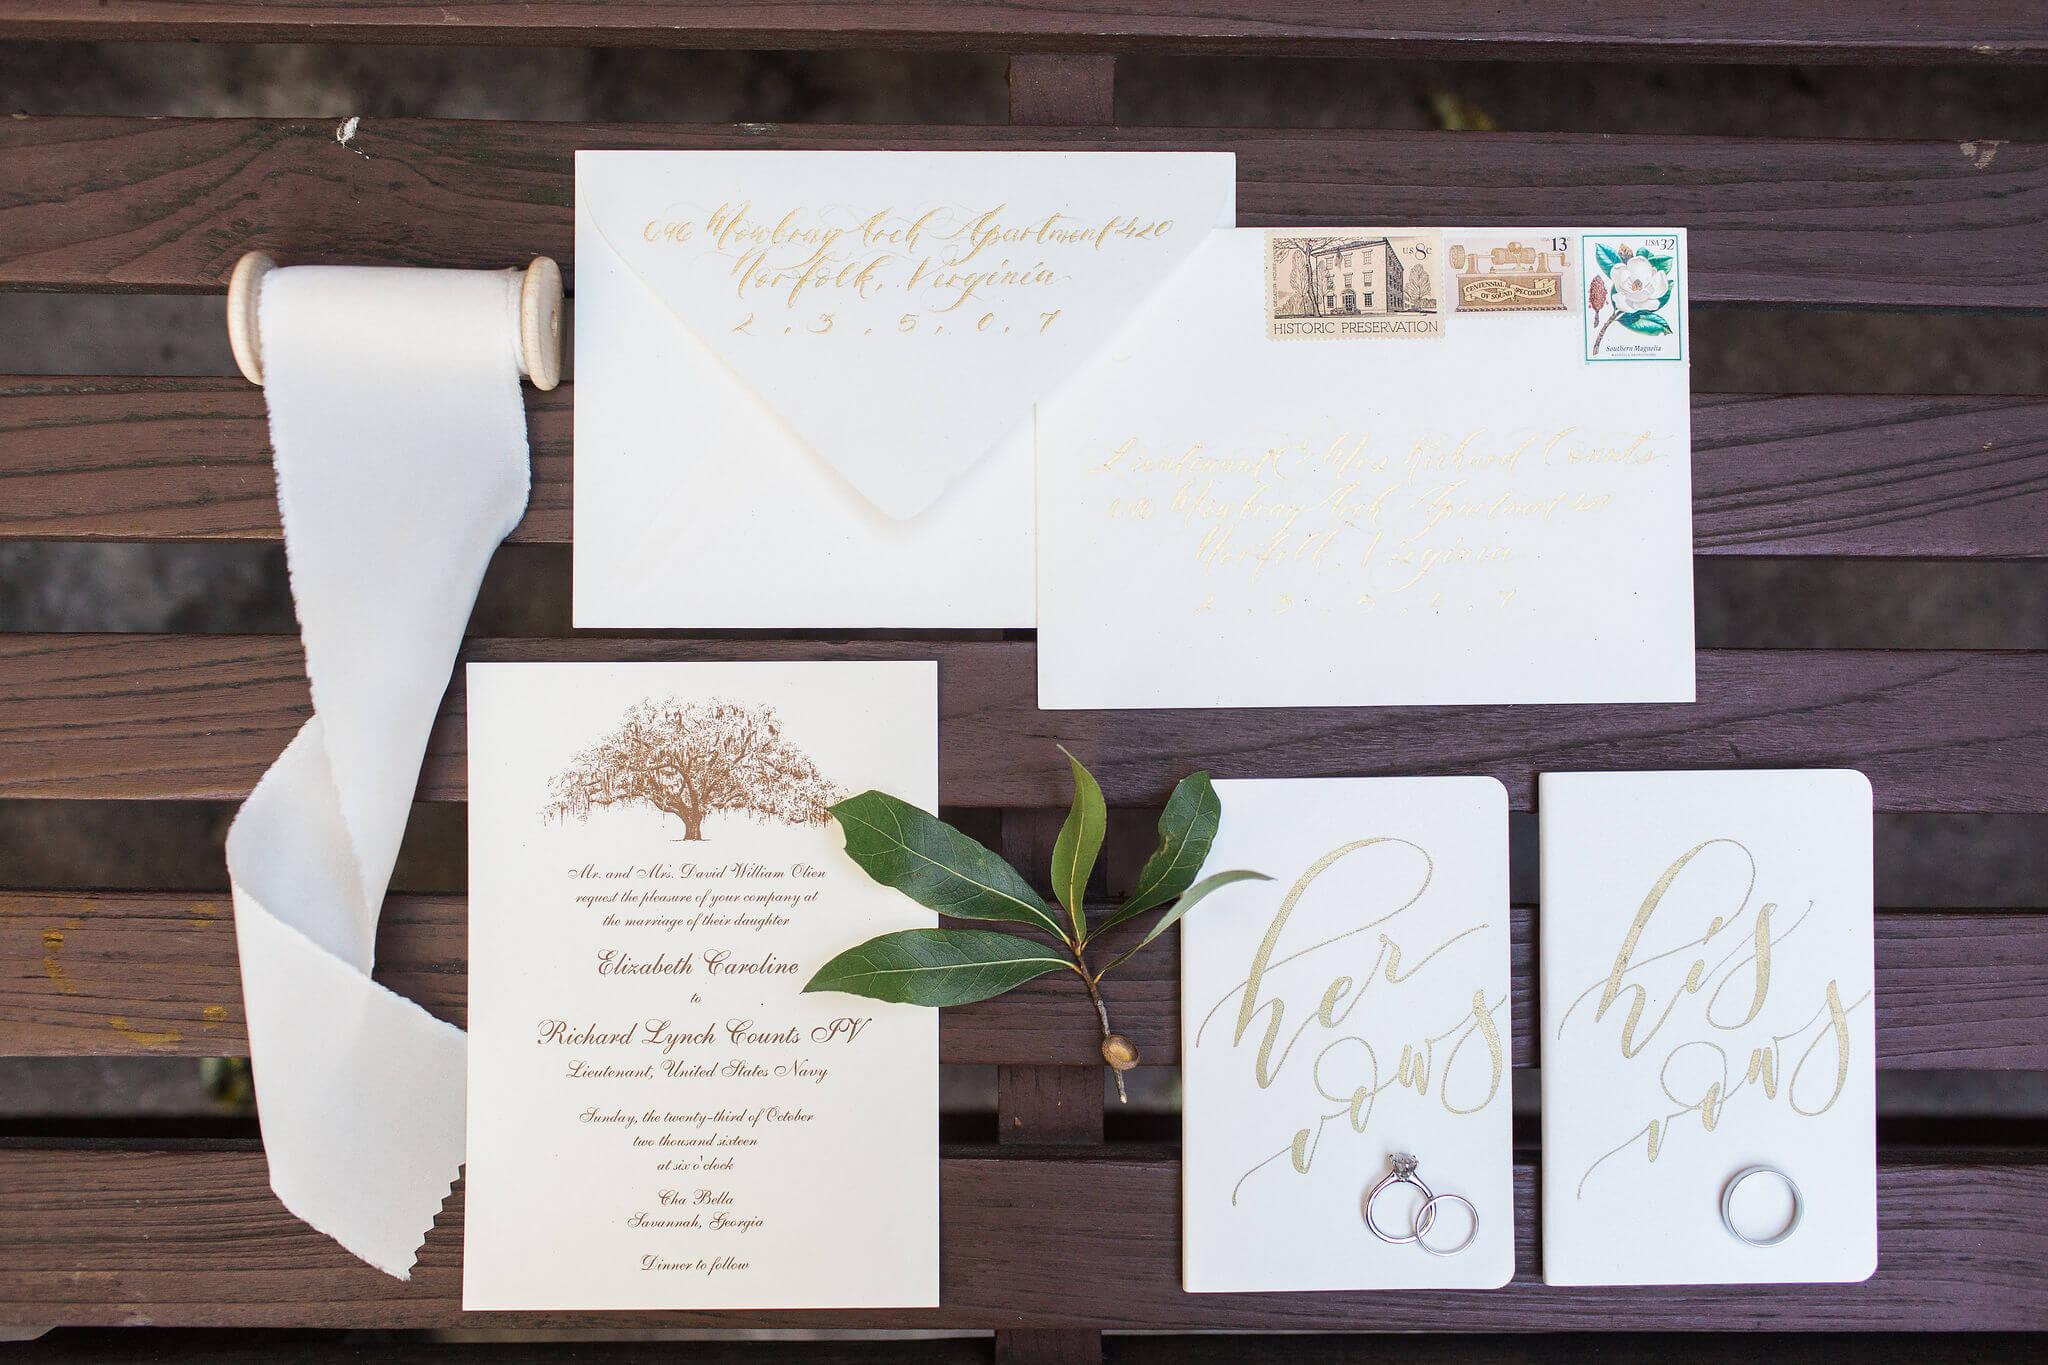 apt-b-photography-savannah-wedding-photographer-savannah-wedding-savannah-elopement-intimate-wedding-photographer-106.JPG